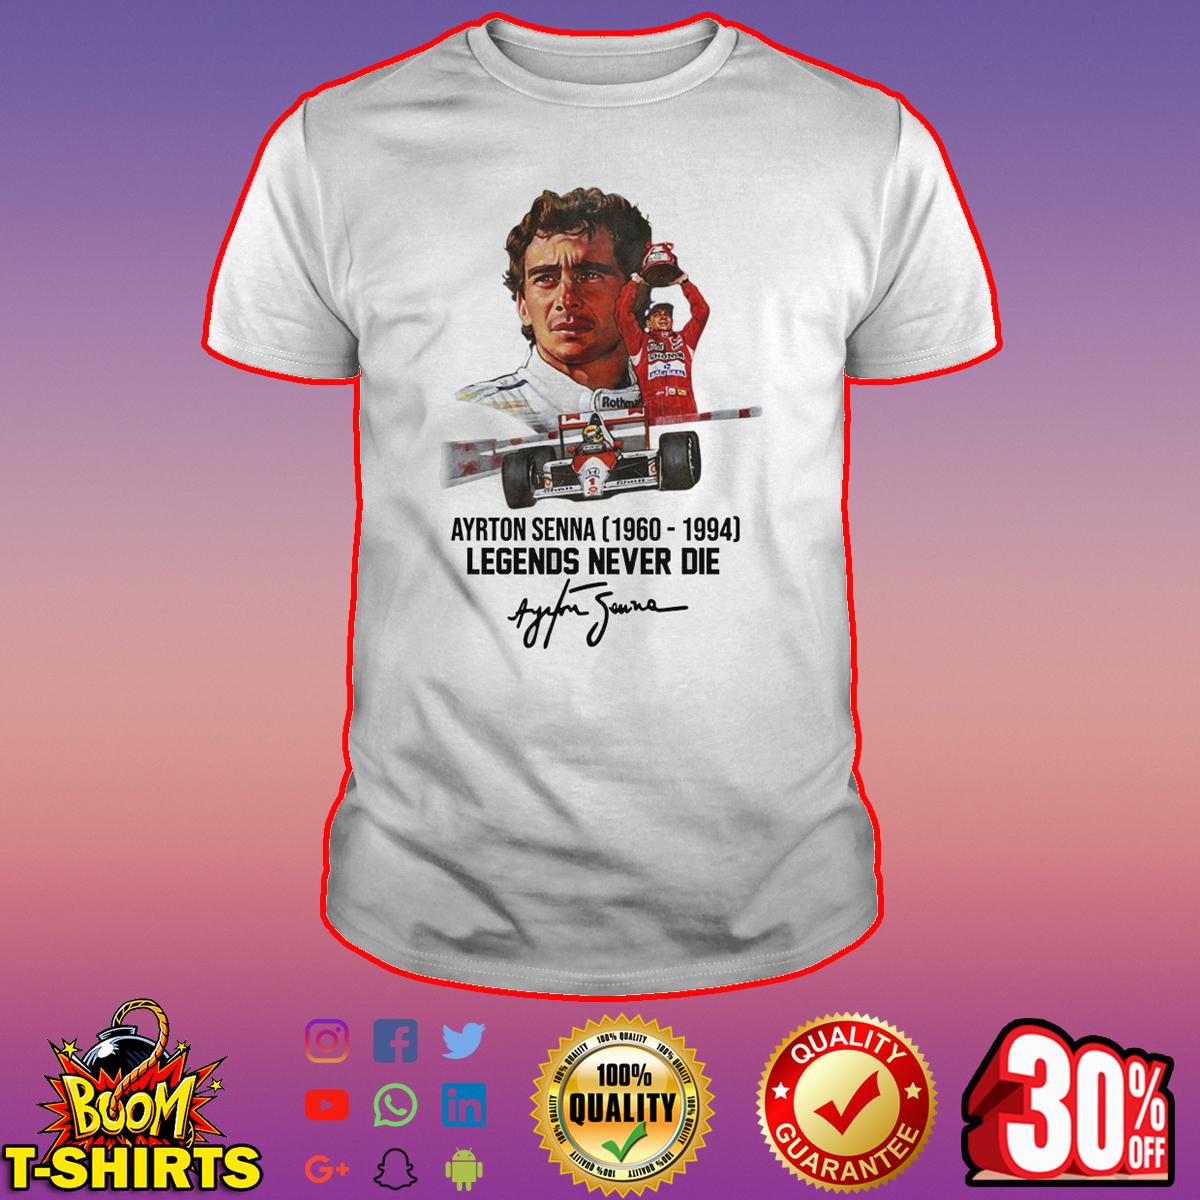 Ayrton Senna legends never die signature shirt